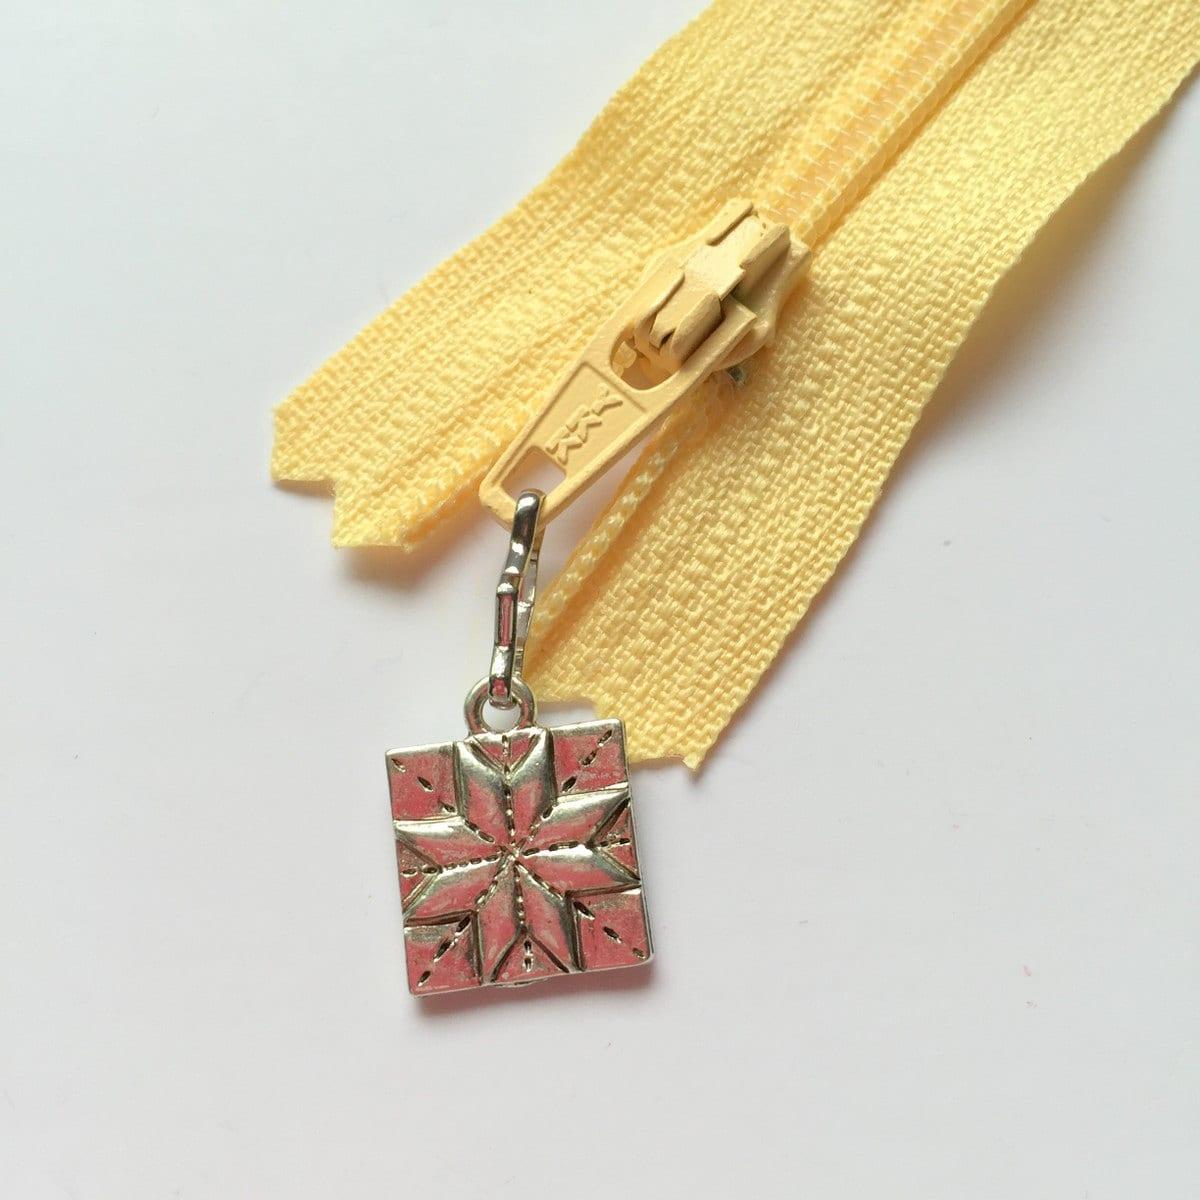 1 quilt block zipper pull charm